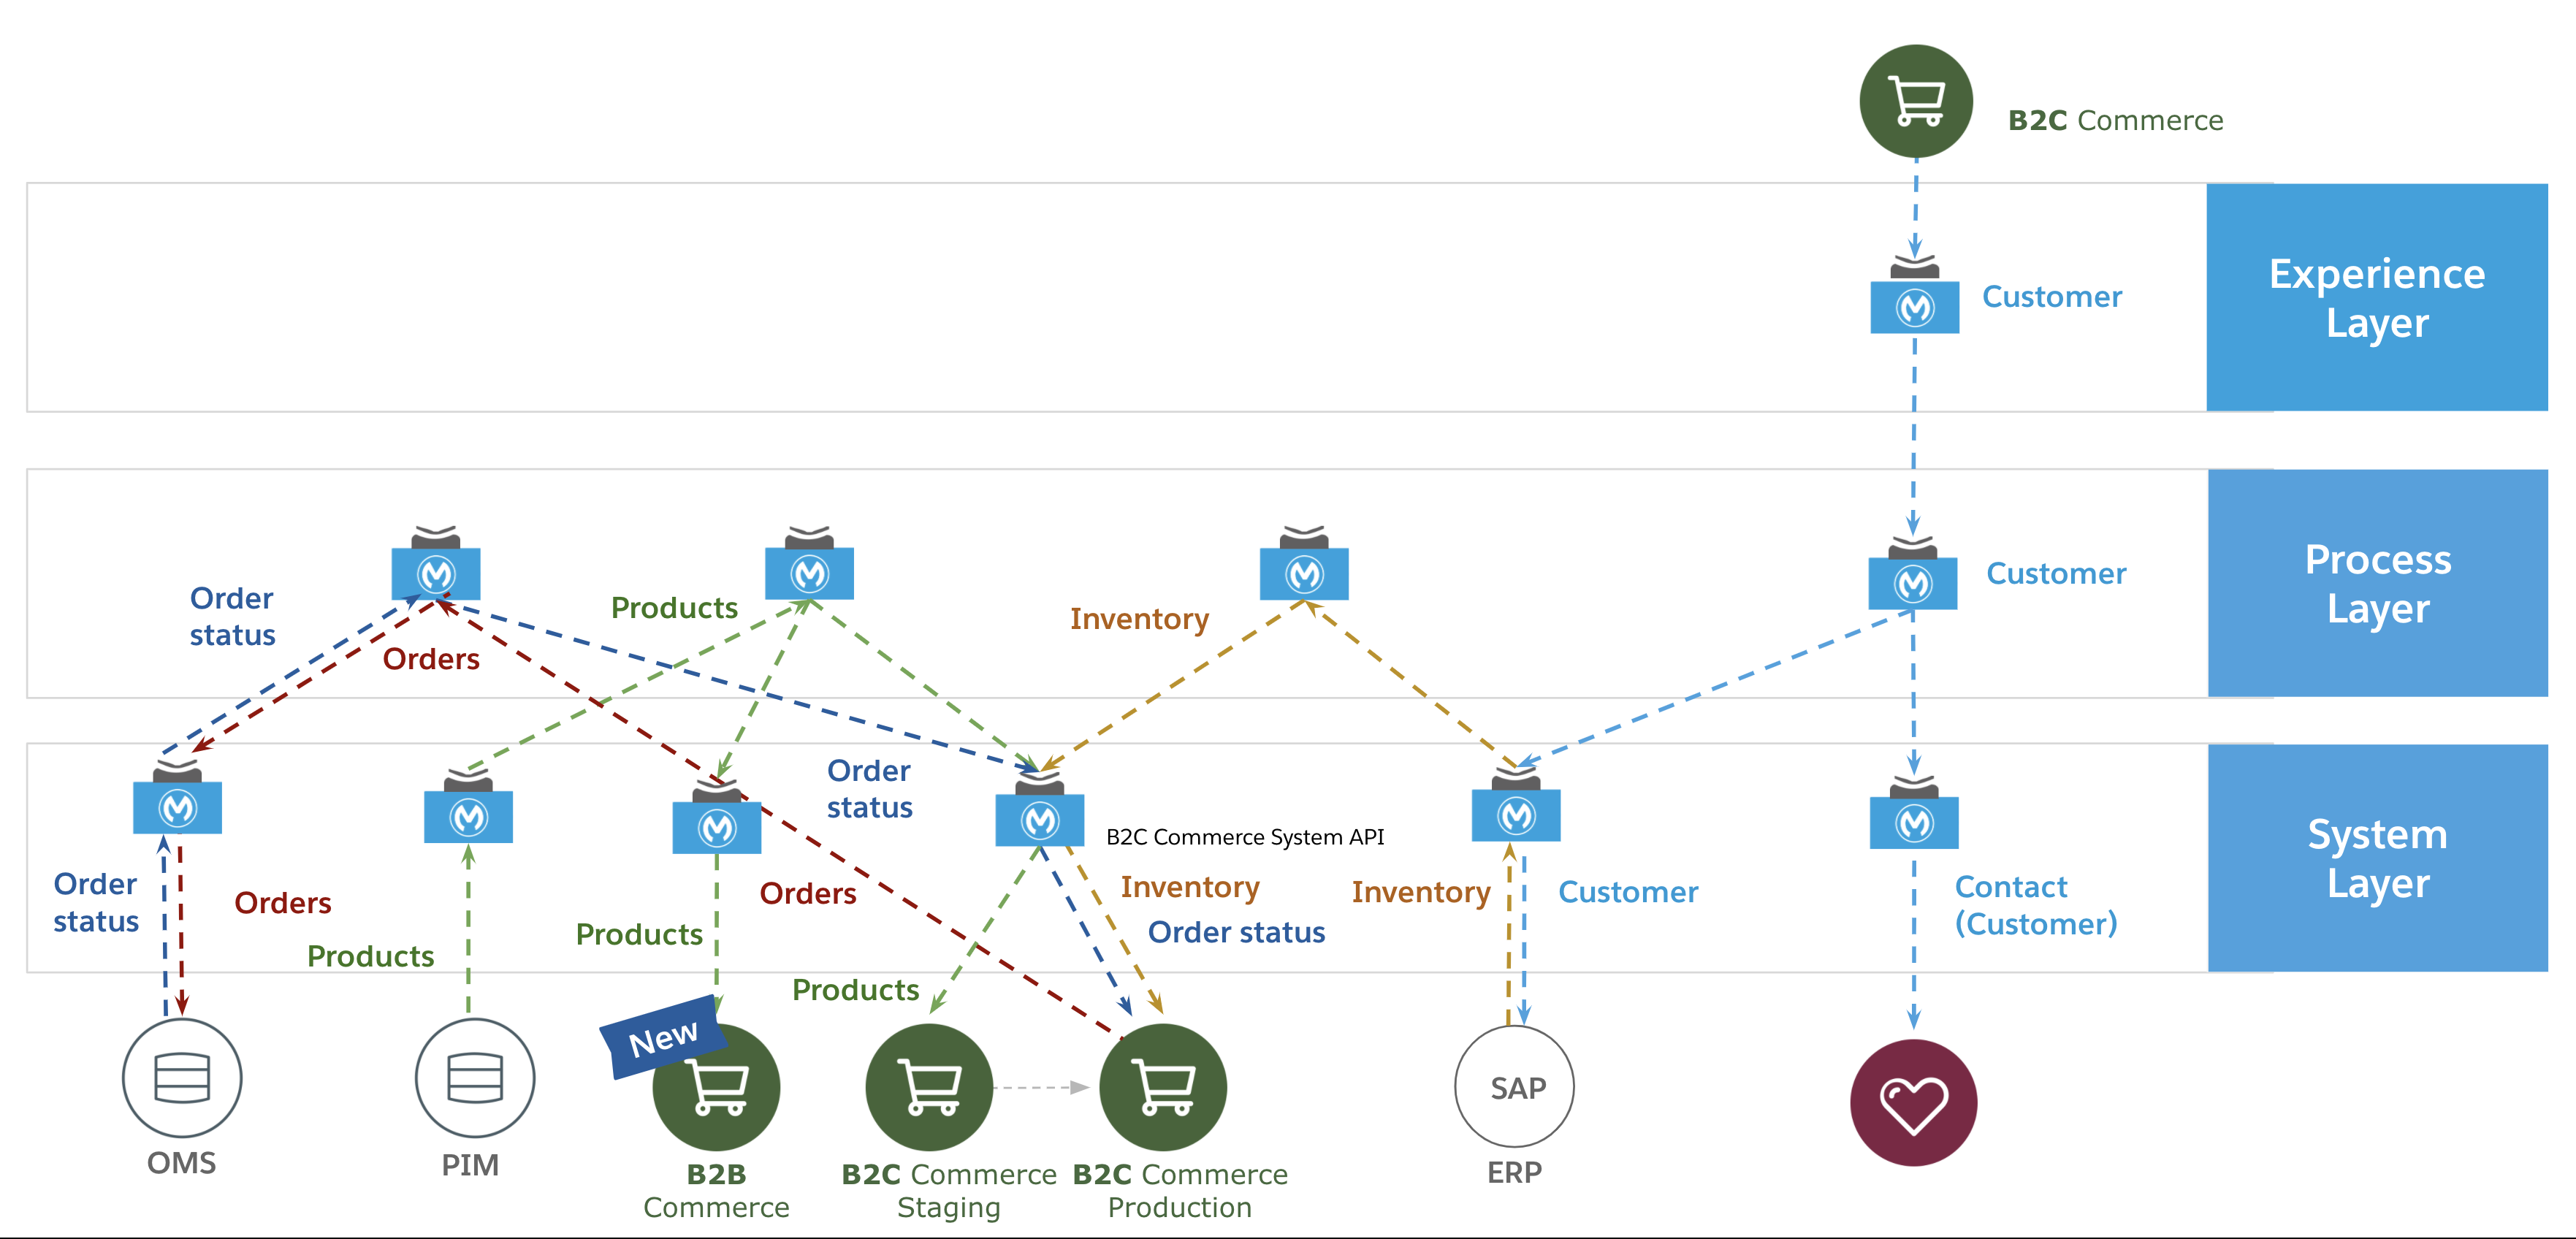 sfc-b2c-com-mainpage-use-case-diagram.png